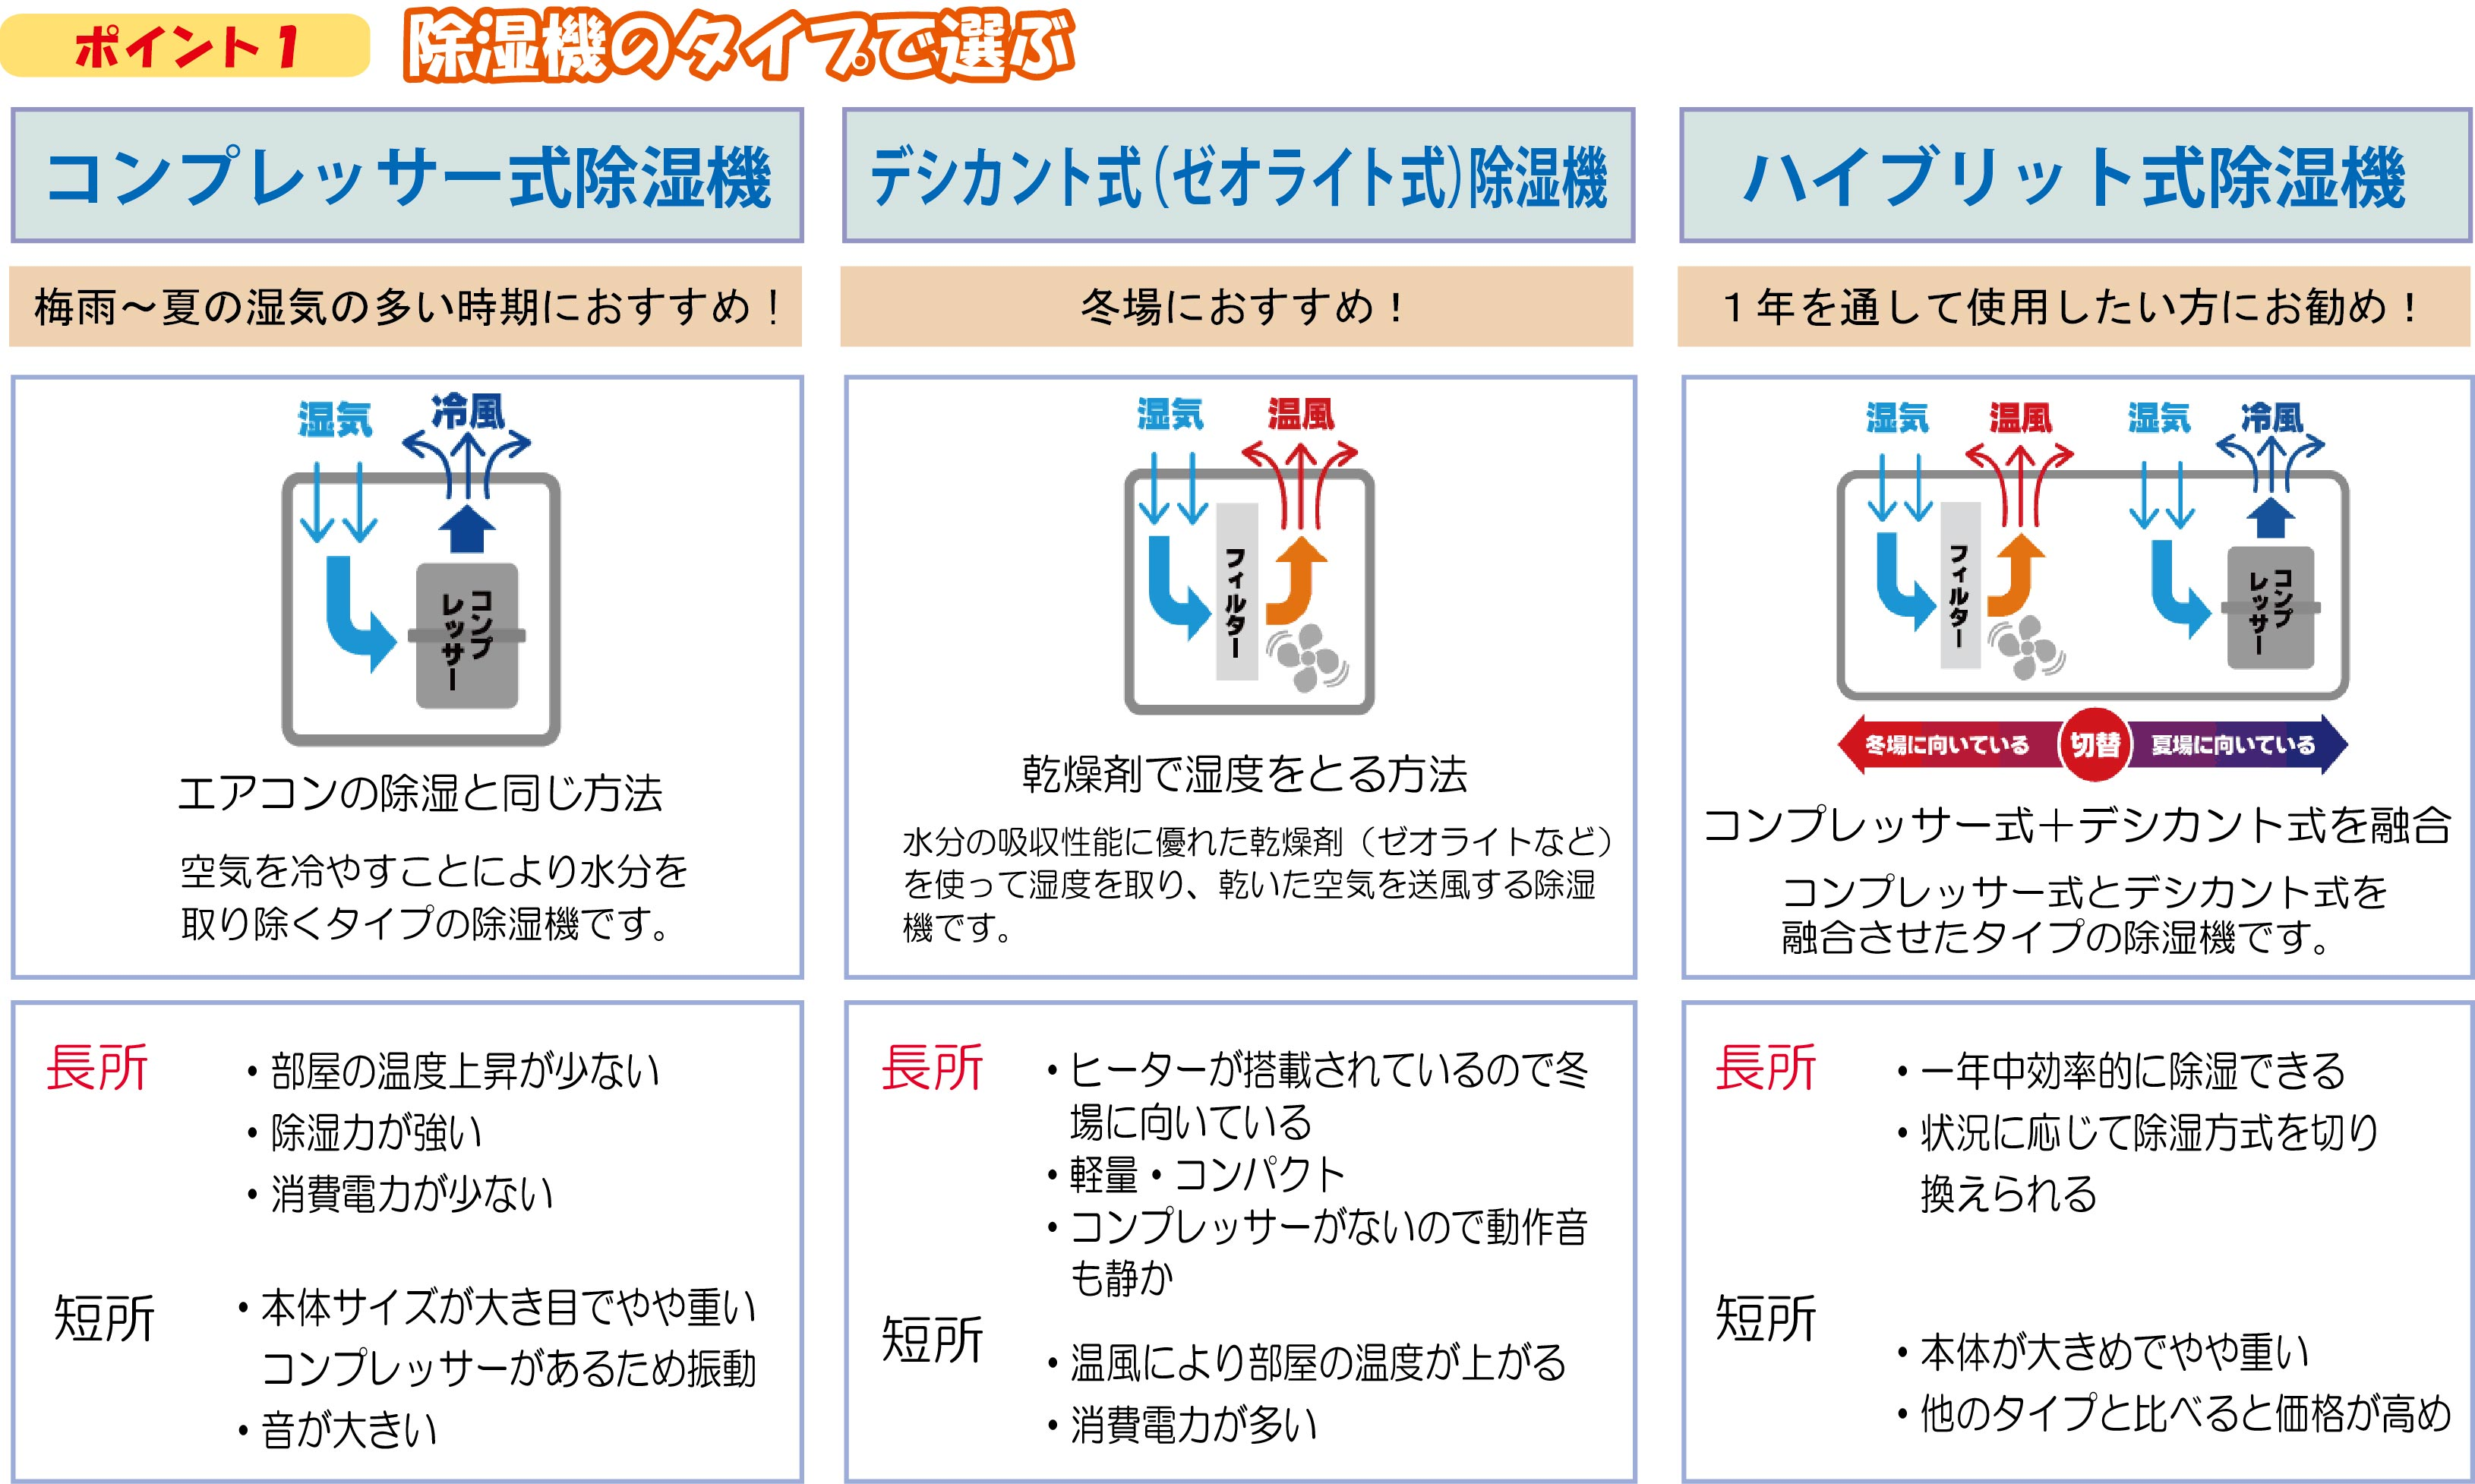 KuraSi-natu-sin86-15.jpg